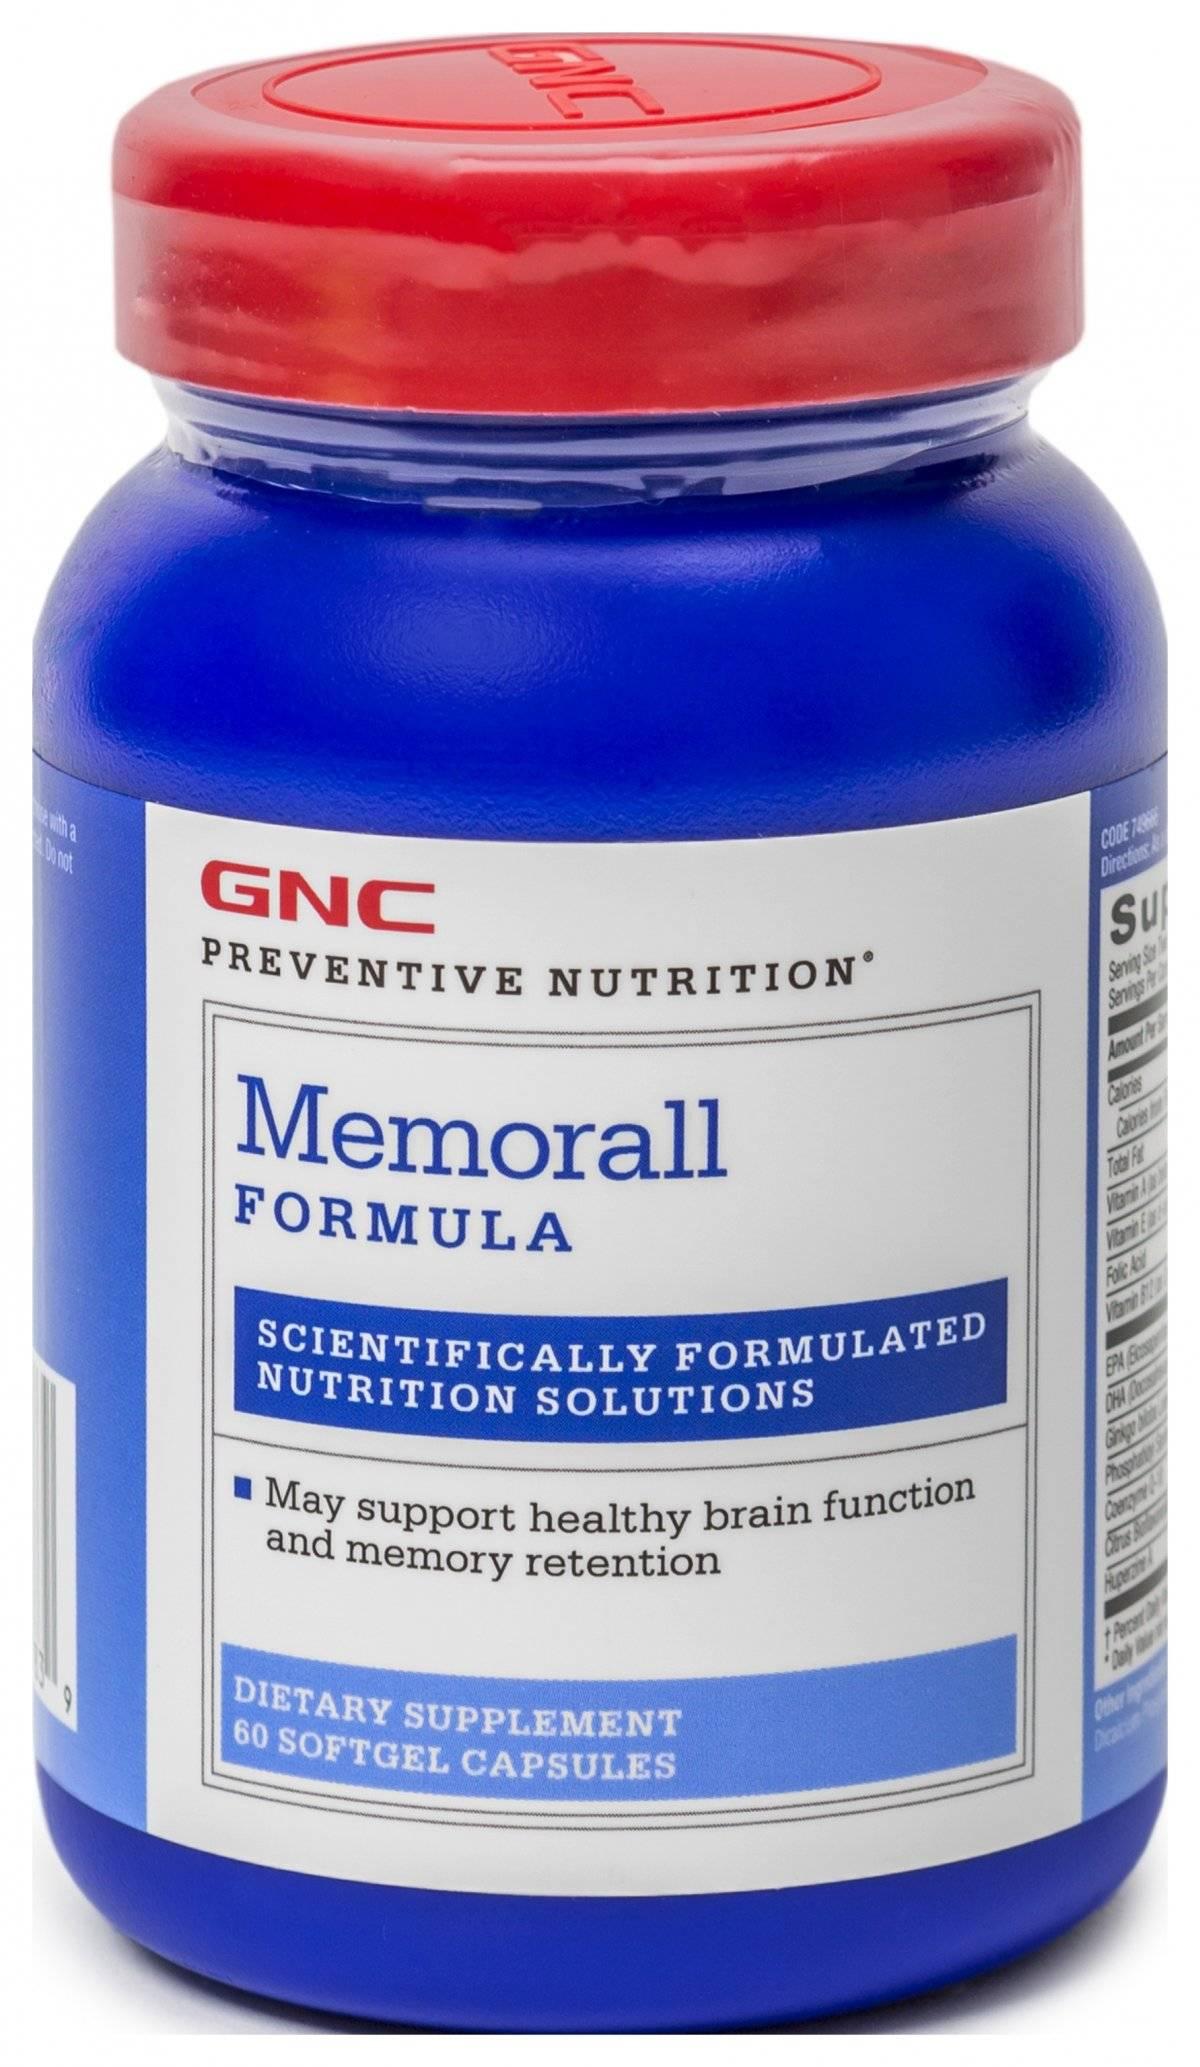 Memorall GNC